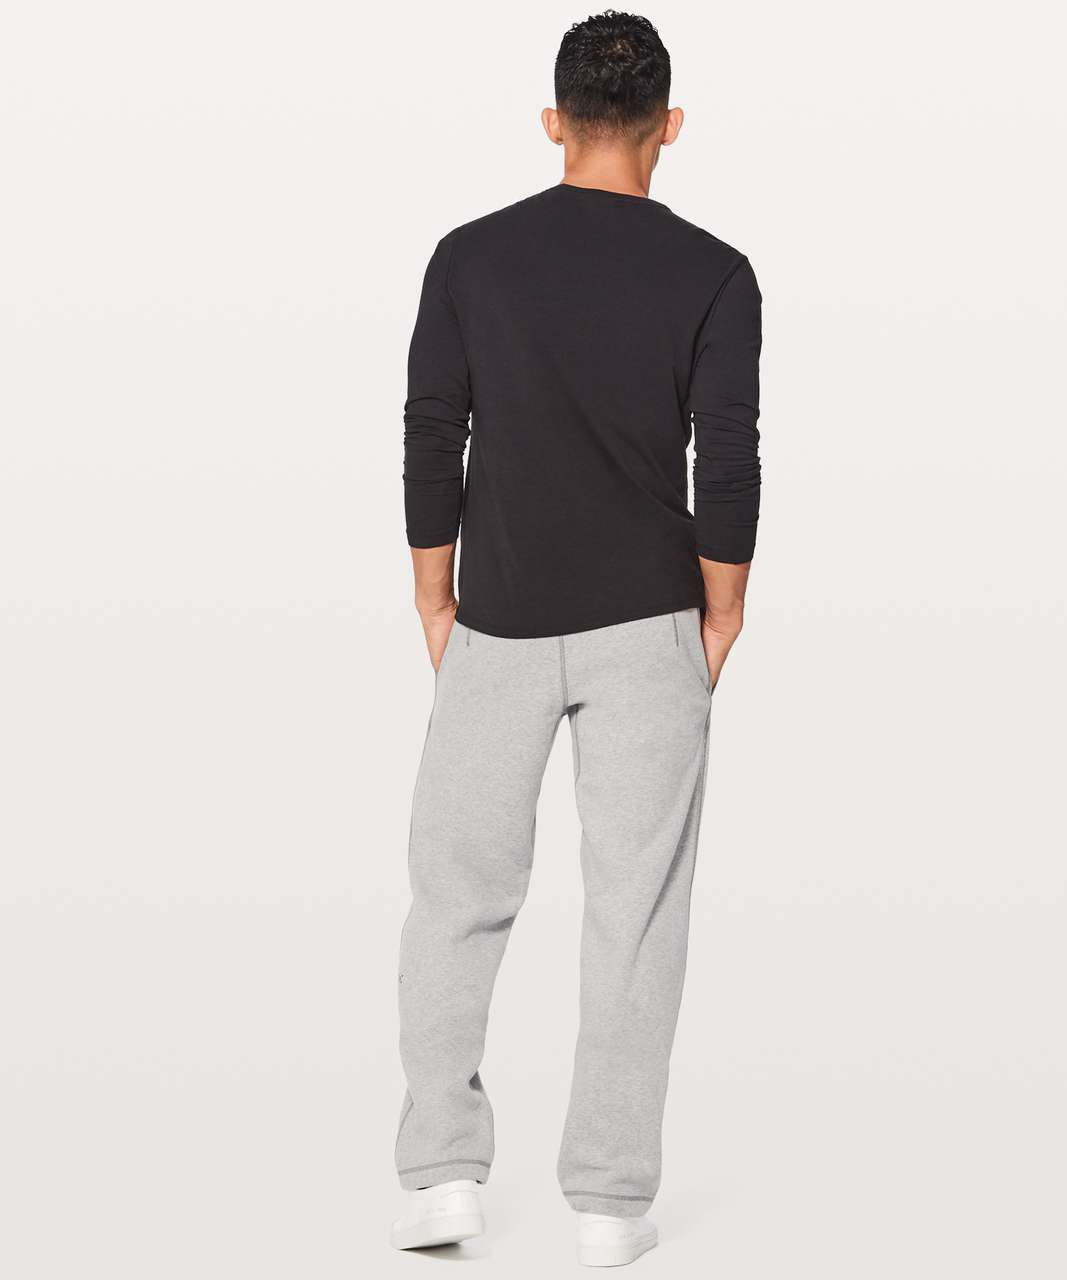 Lululemon Hustle Pant (Regular) - Heathered Medium Grey